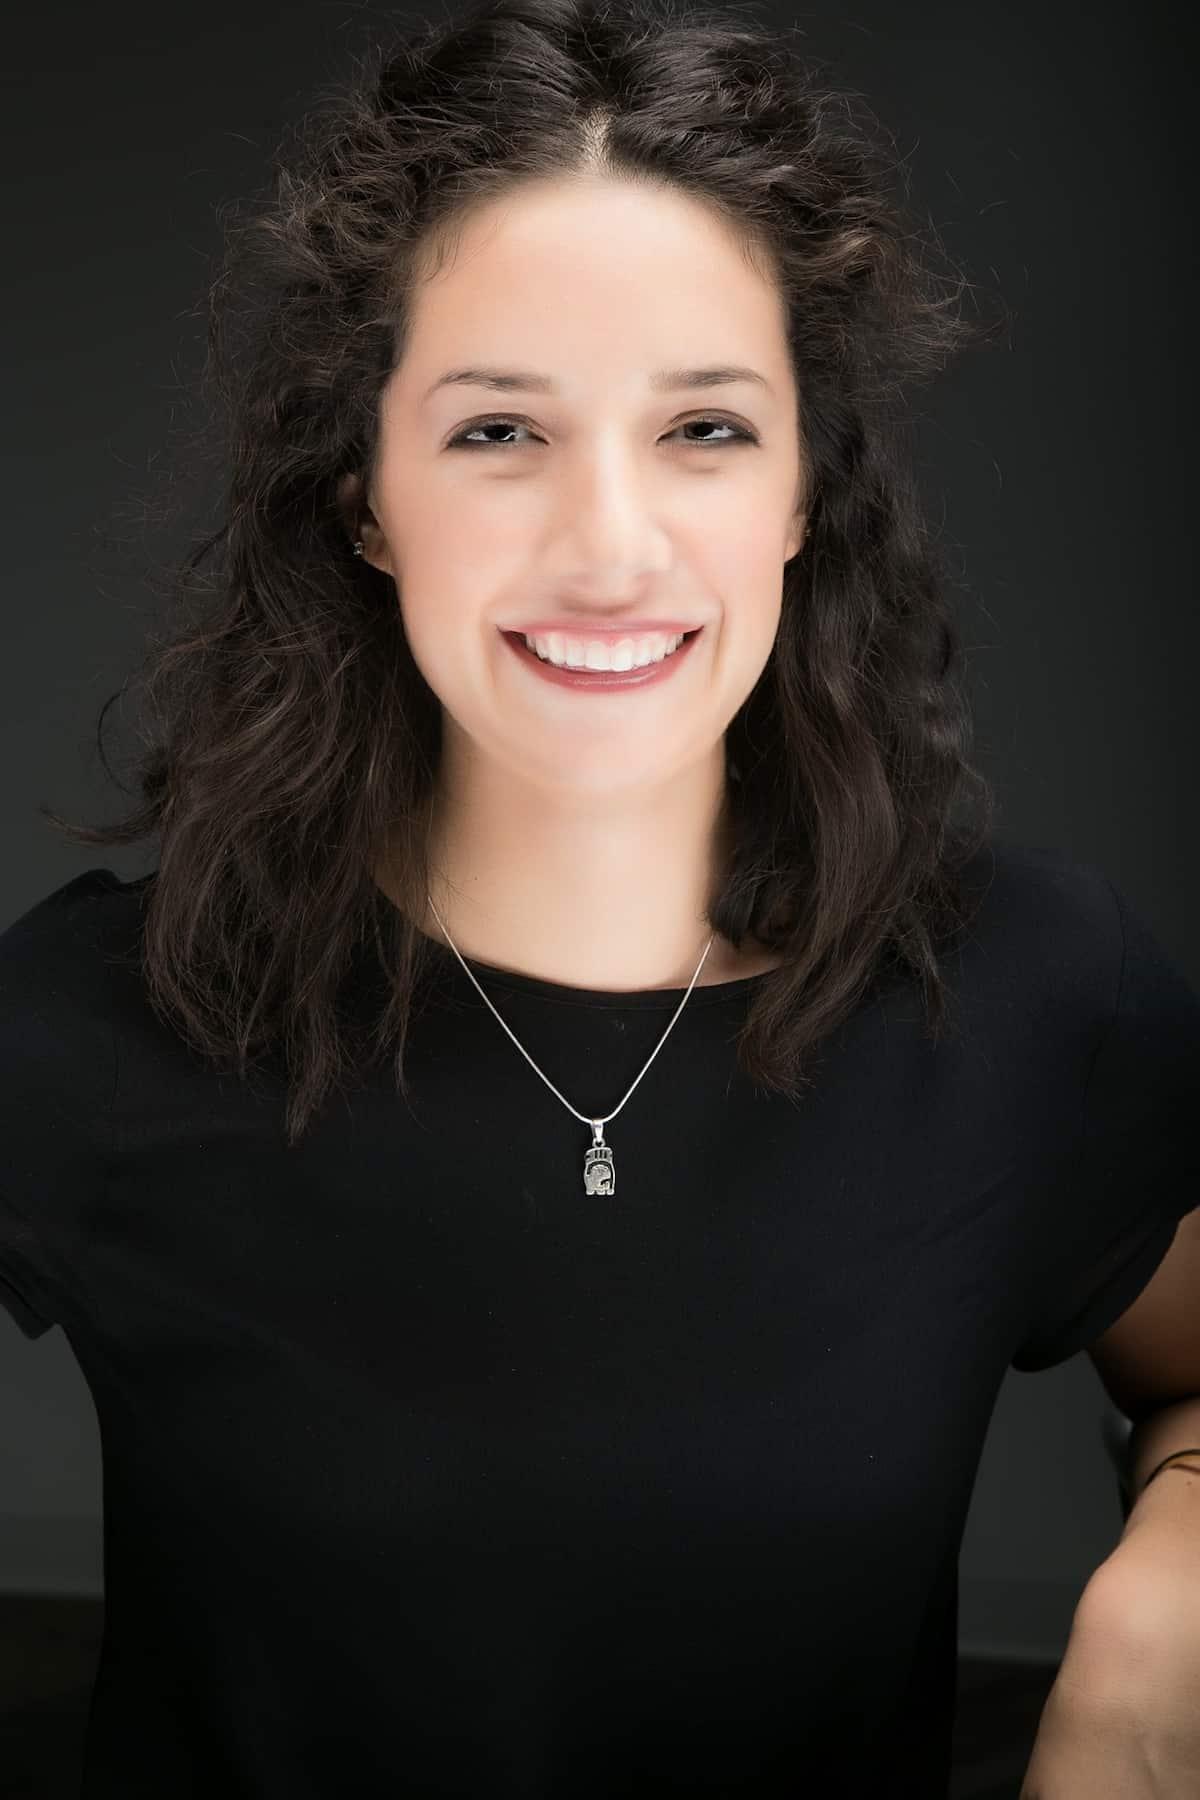 SWE Staff Spotlight: Camryn Wagner